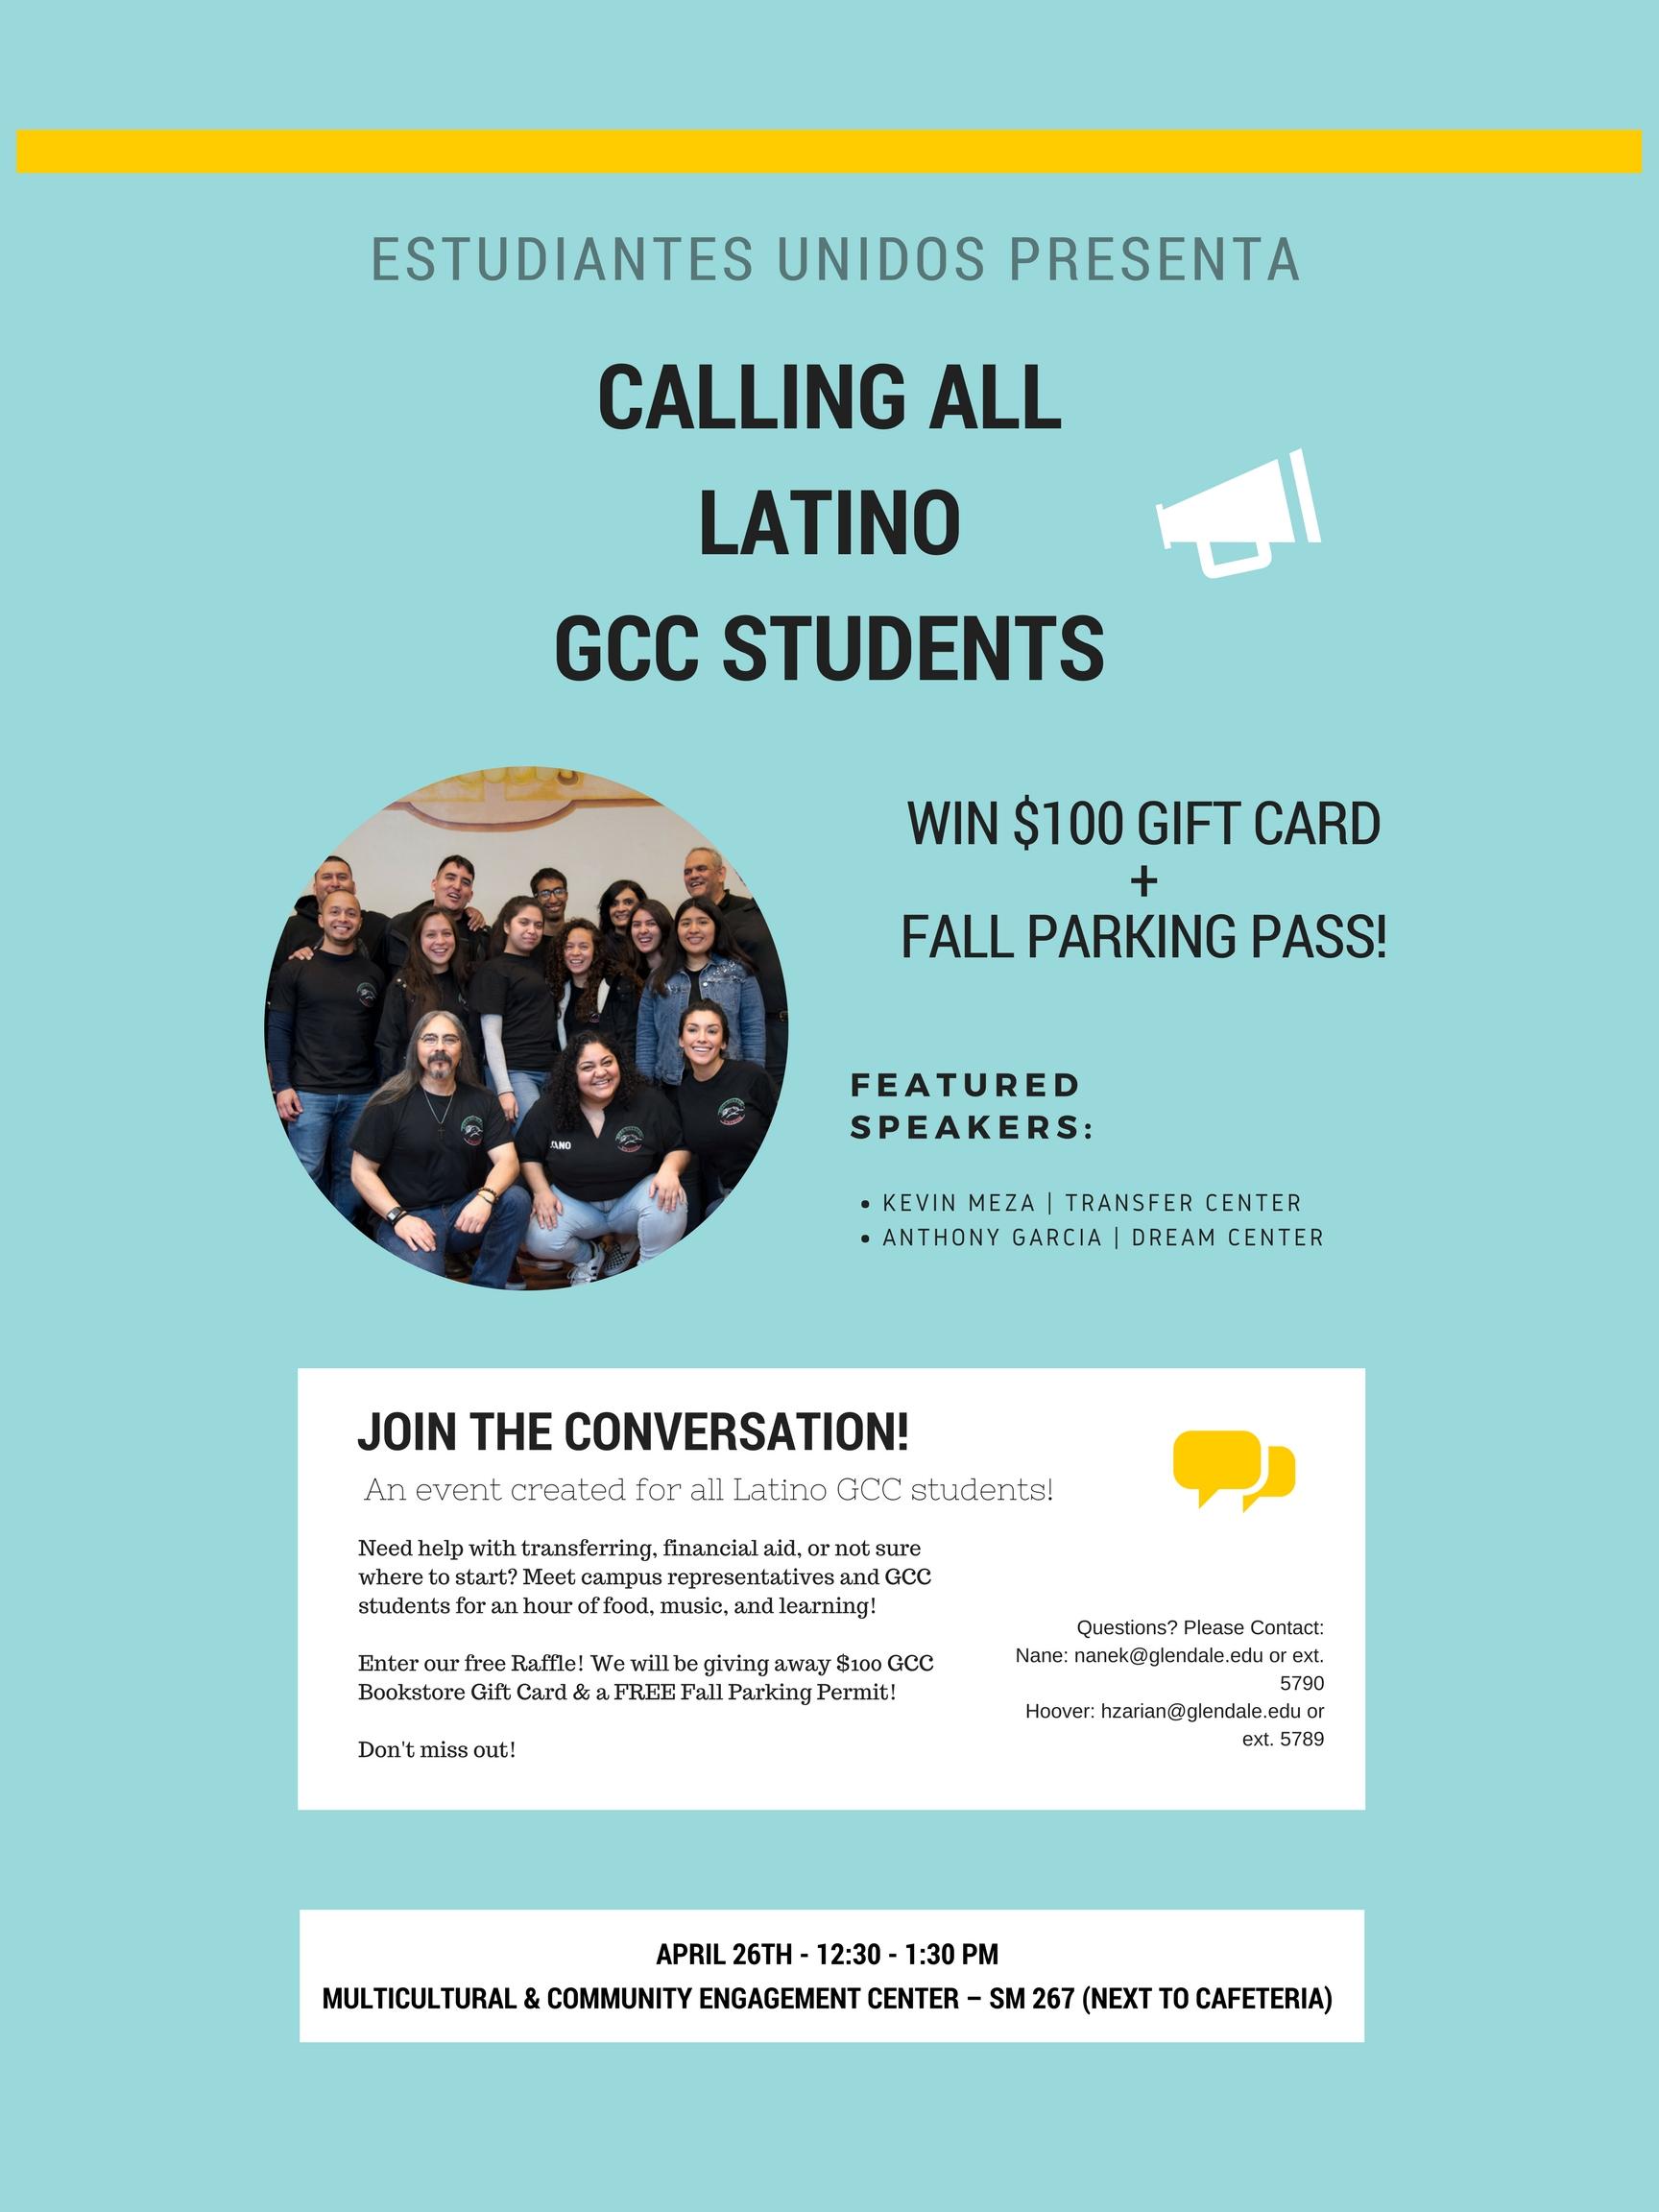 Estudiantes Unidos Presenta | GCC Calendar - All events